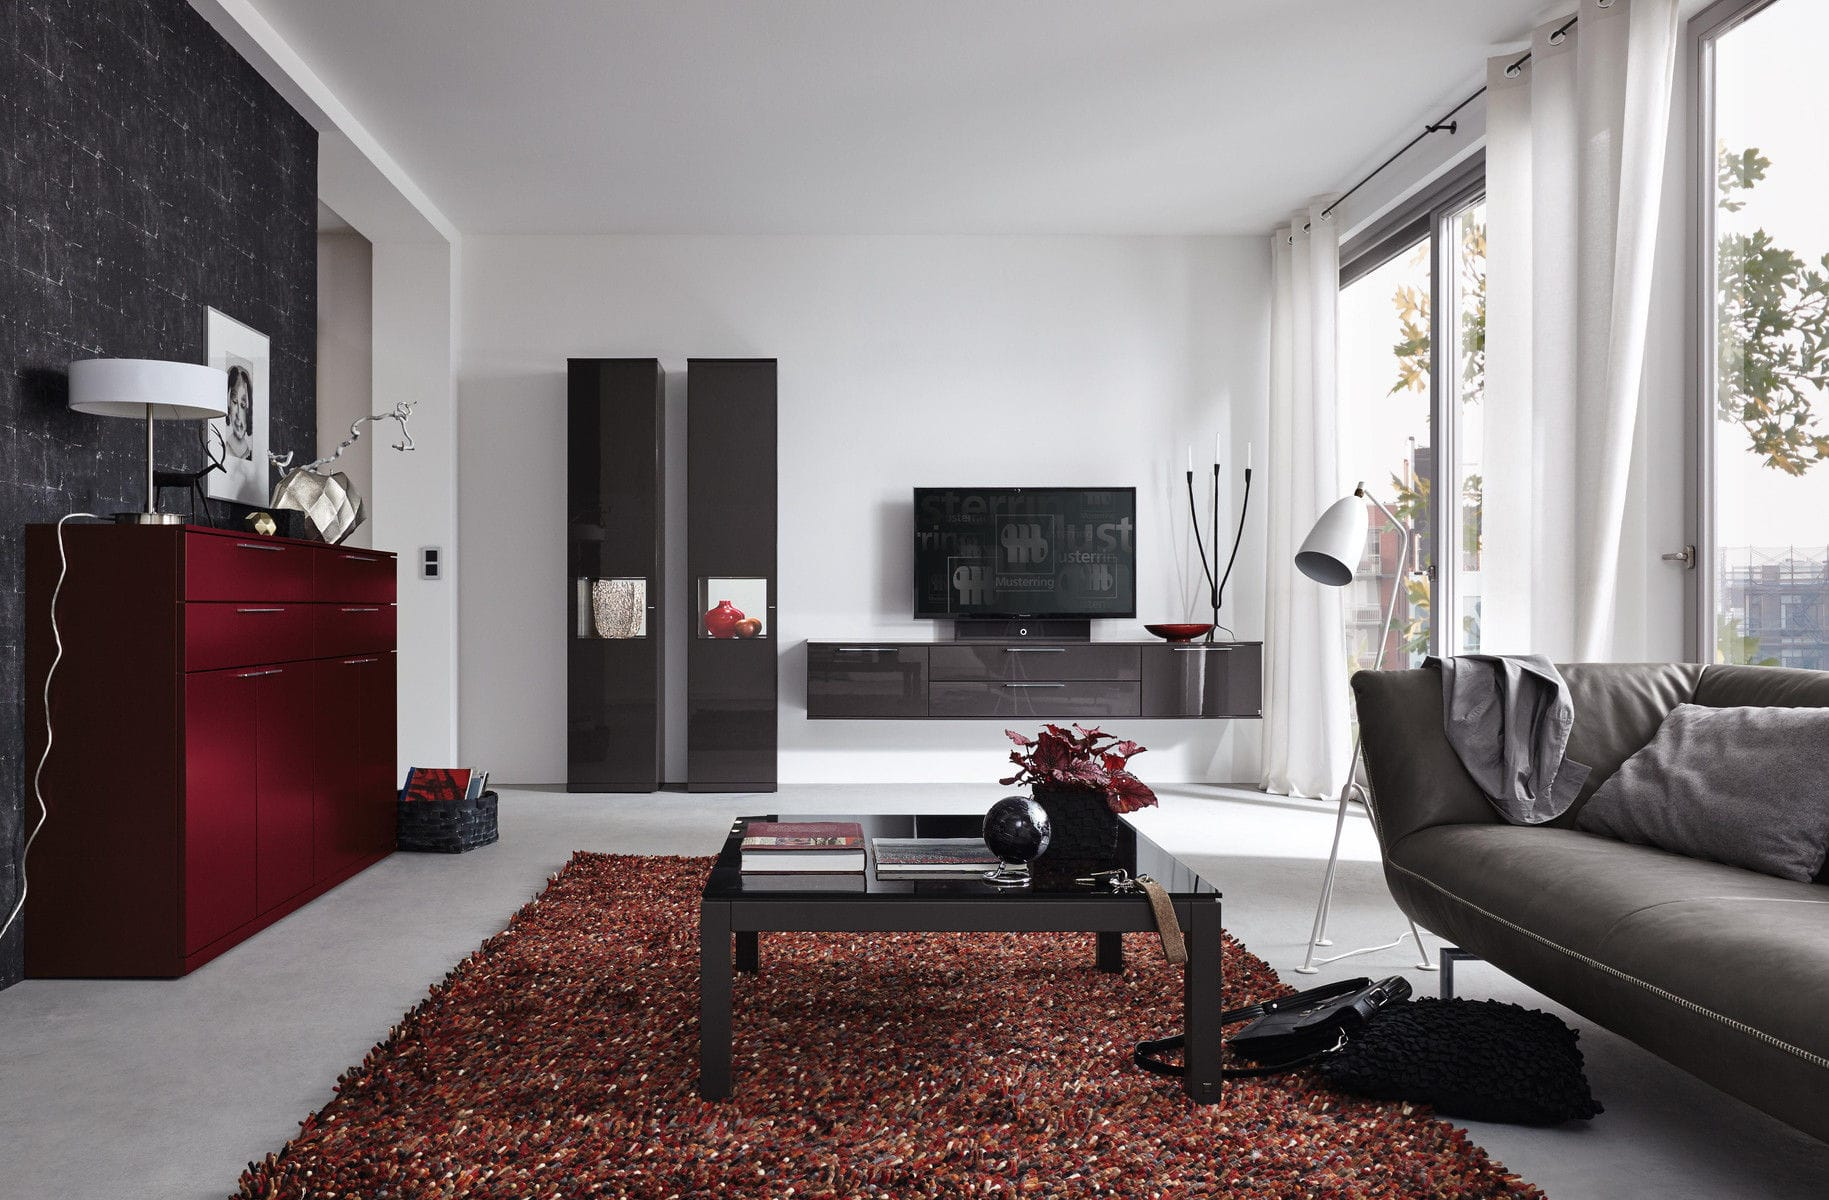 Moderne Wohnwand / lackiertes Holz / Holzfurnier - KARA-SYSTEM ...